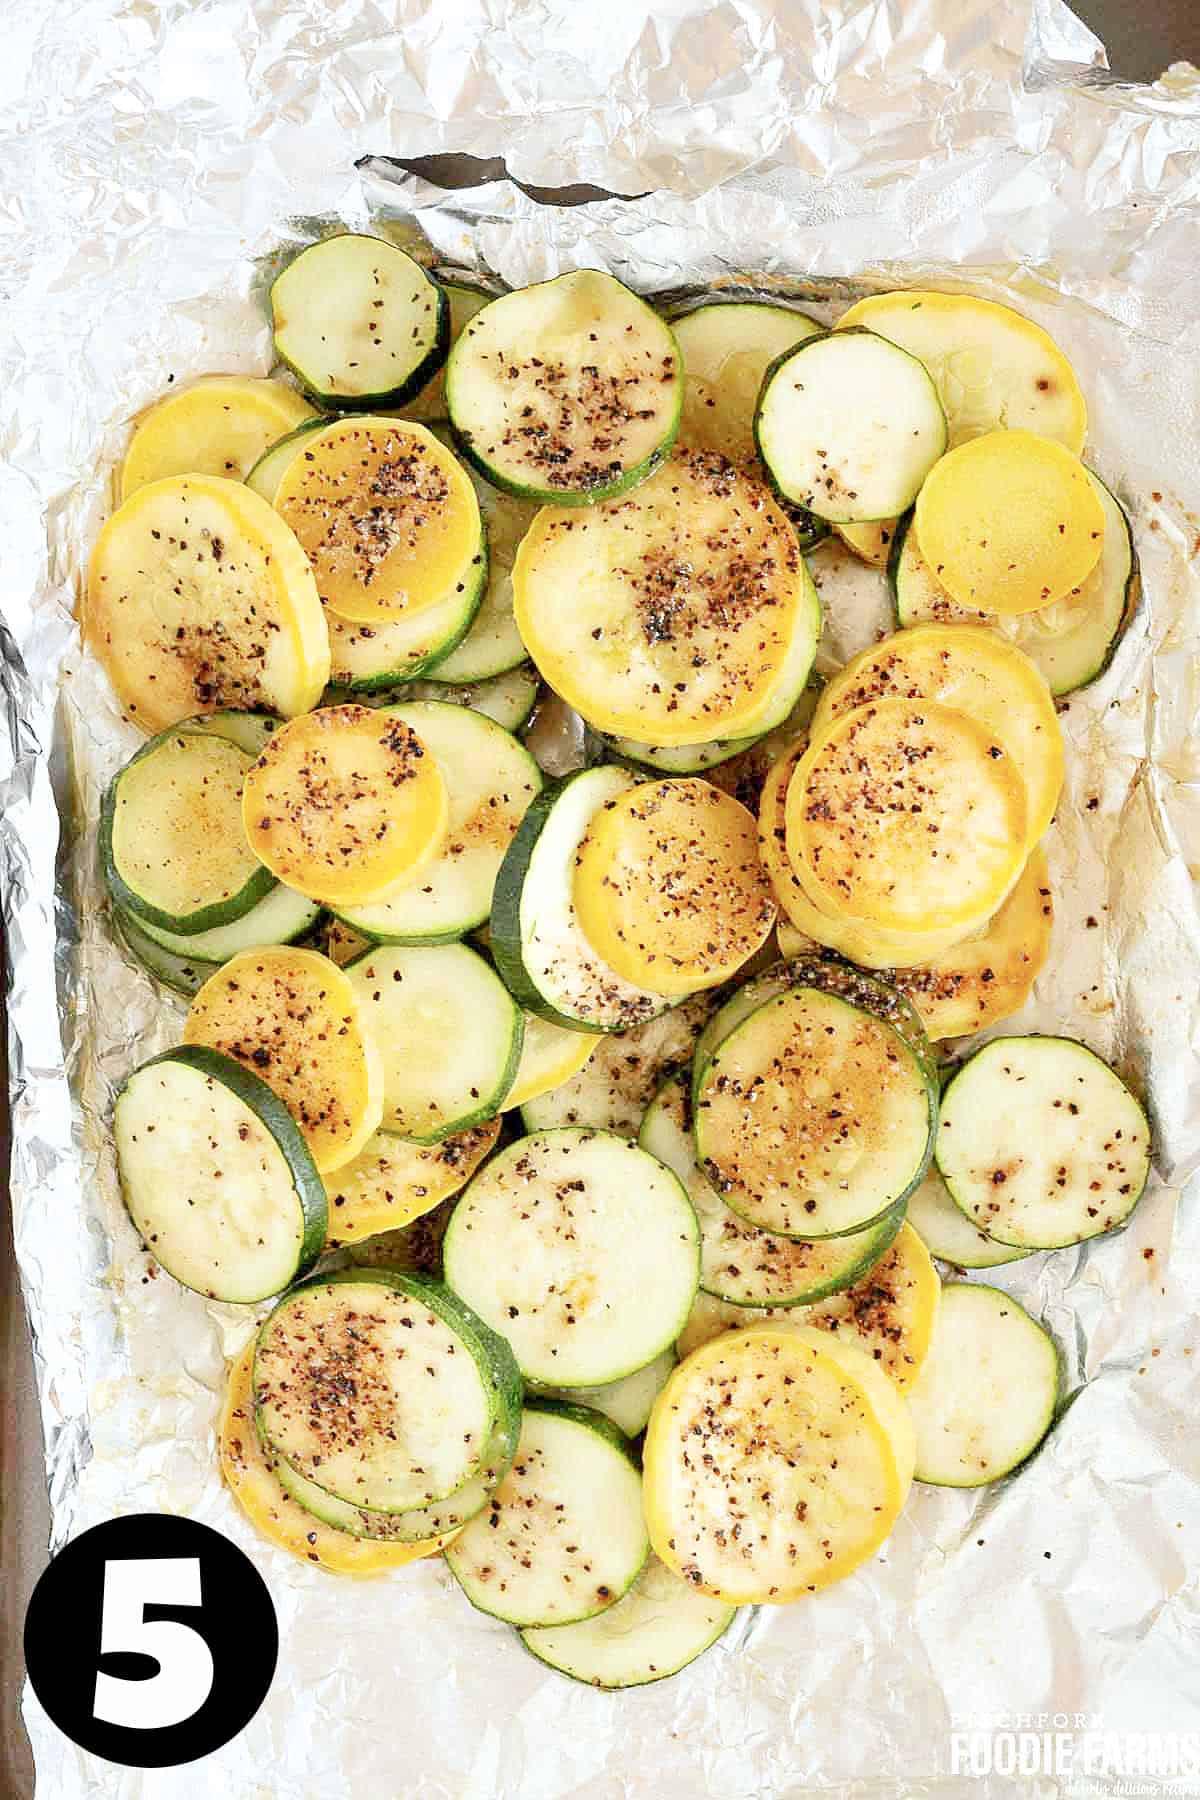 Grilled zucchini and squash in a foil pack.